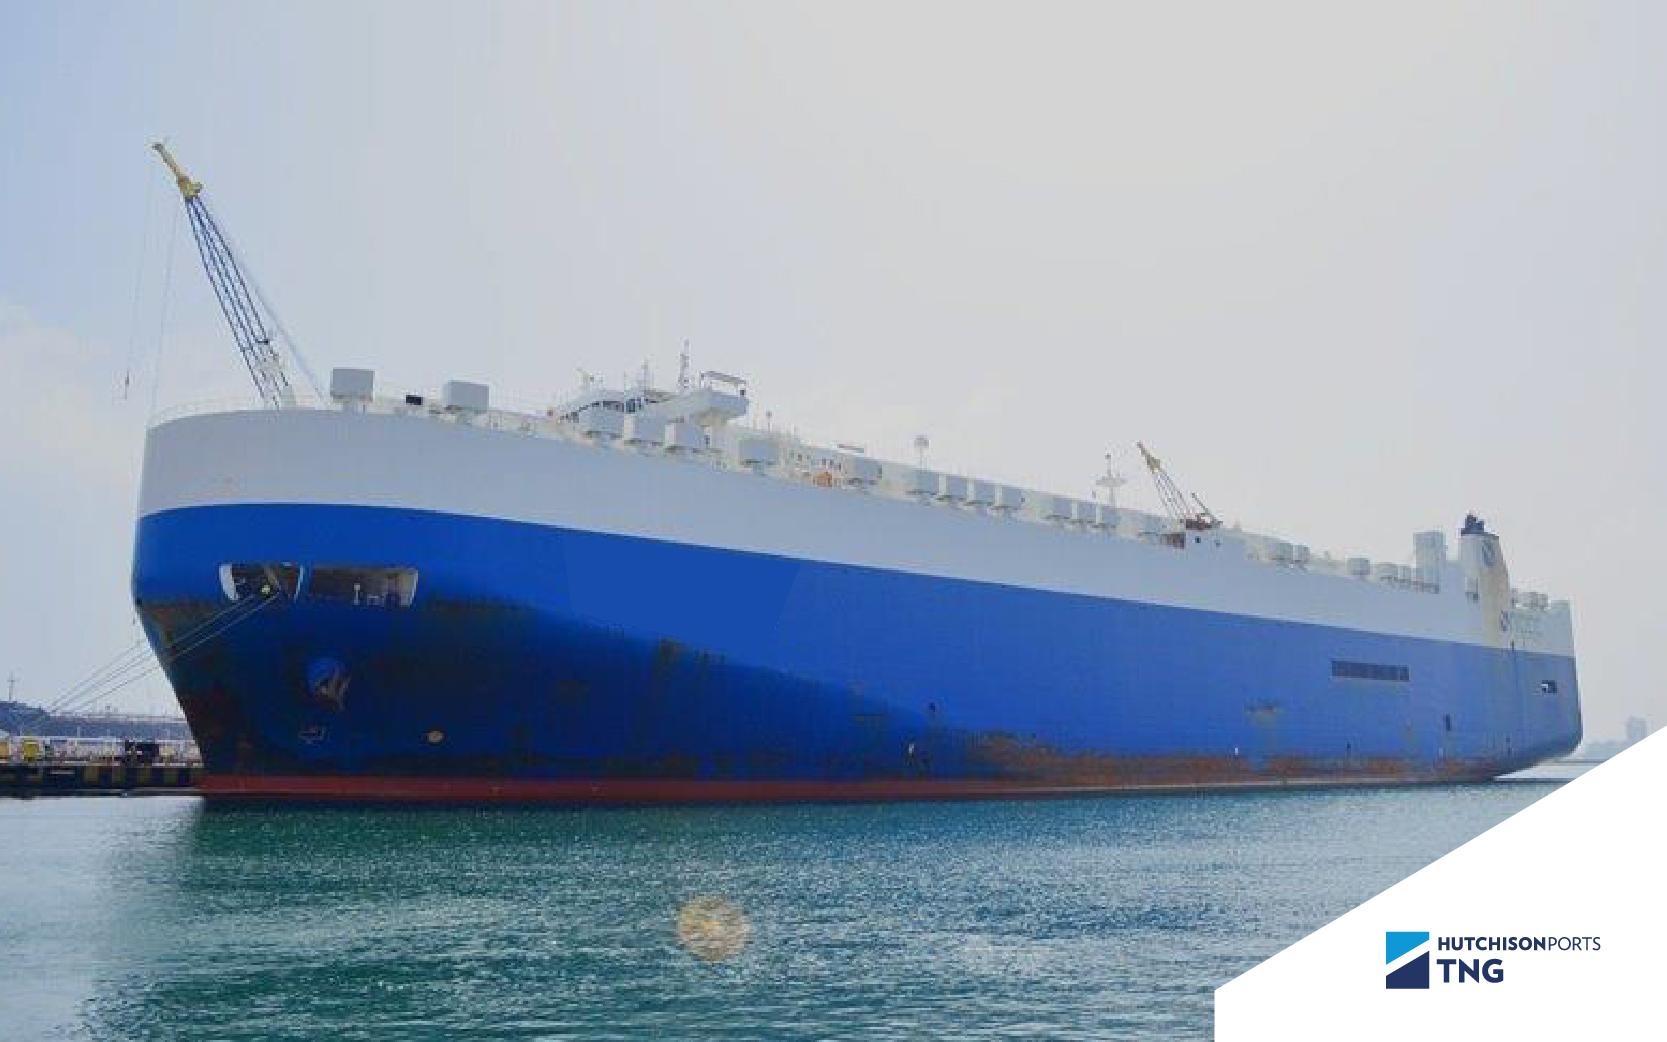 Reparación de RoRo a flote